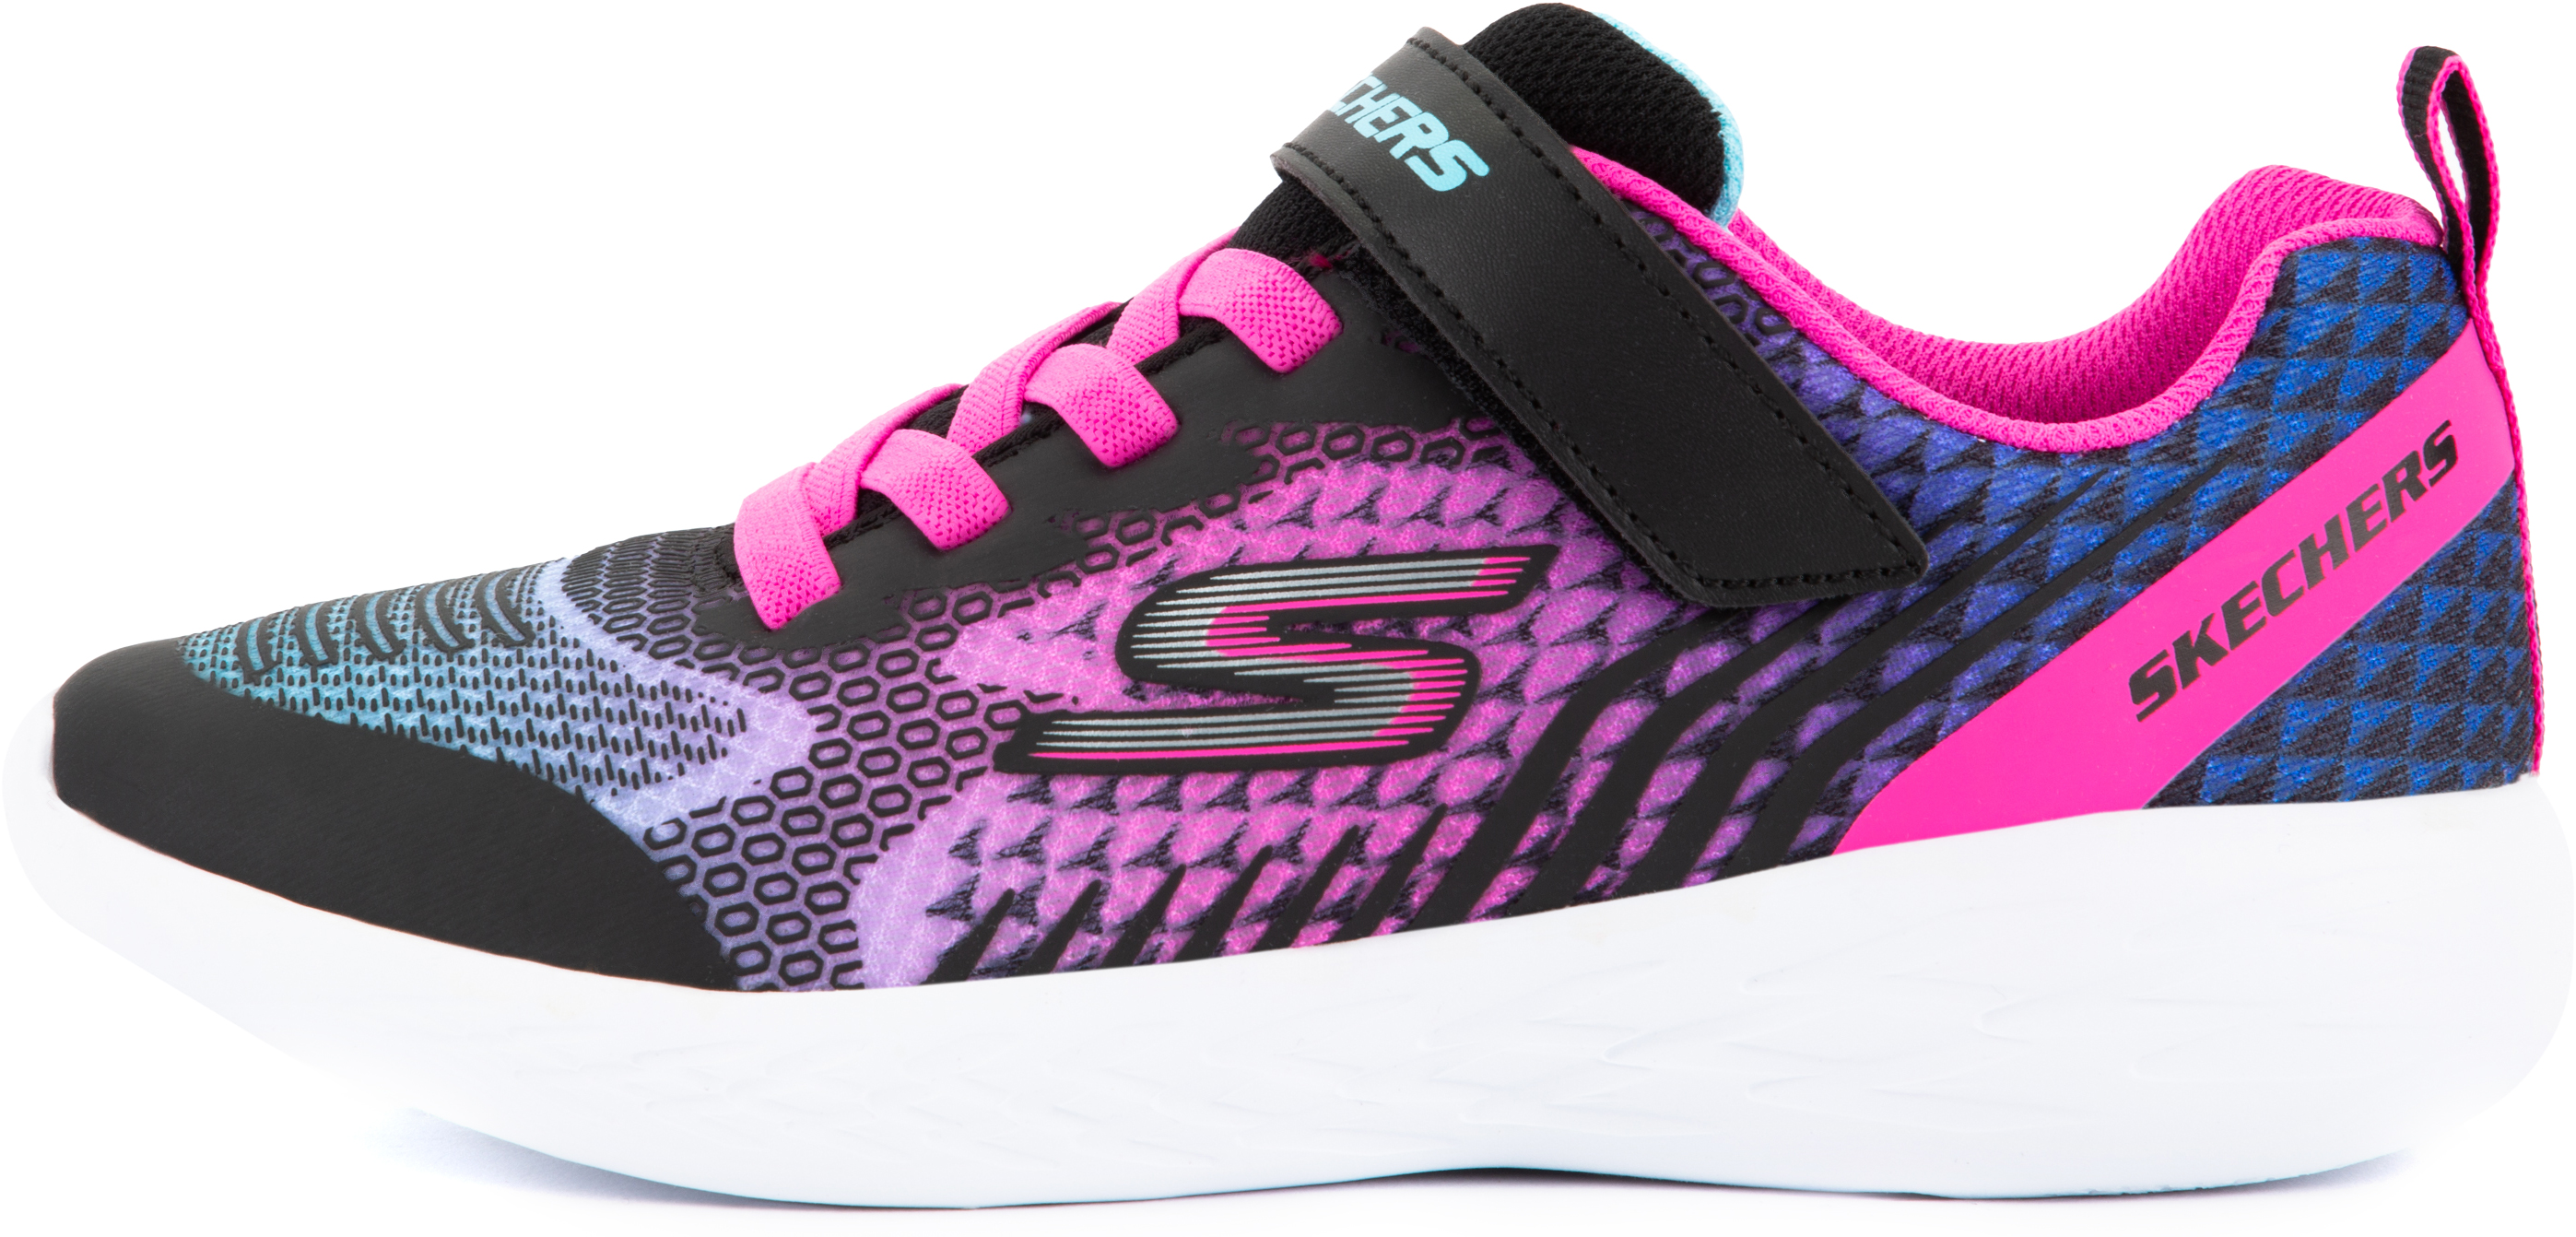 skechers кроссовки для девочек skechers go run 600 sparkle speed размер 38 Skechers Полуботинки для девочек Skechers Go Run 600-Radiant Runner, размер 27